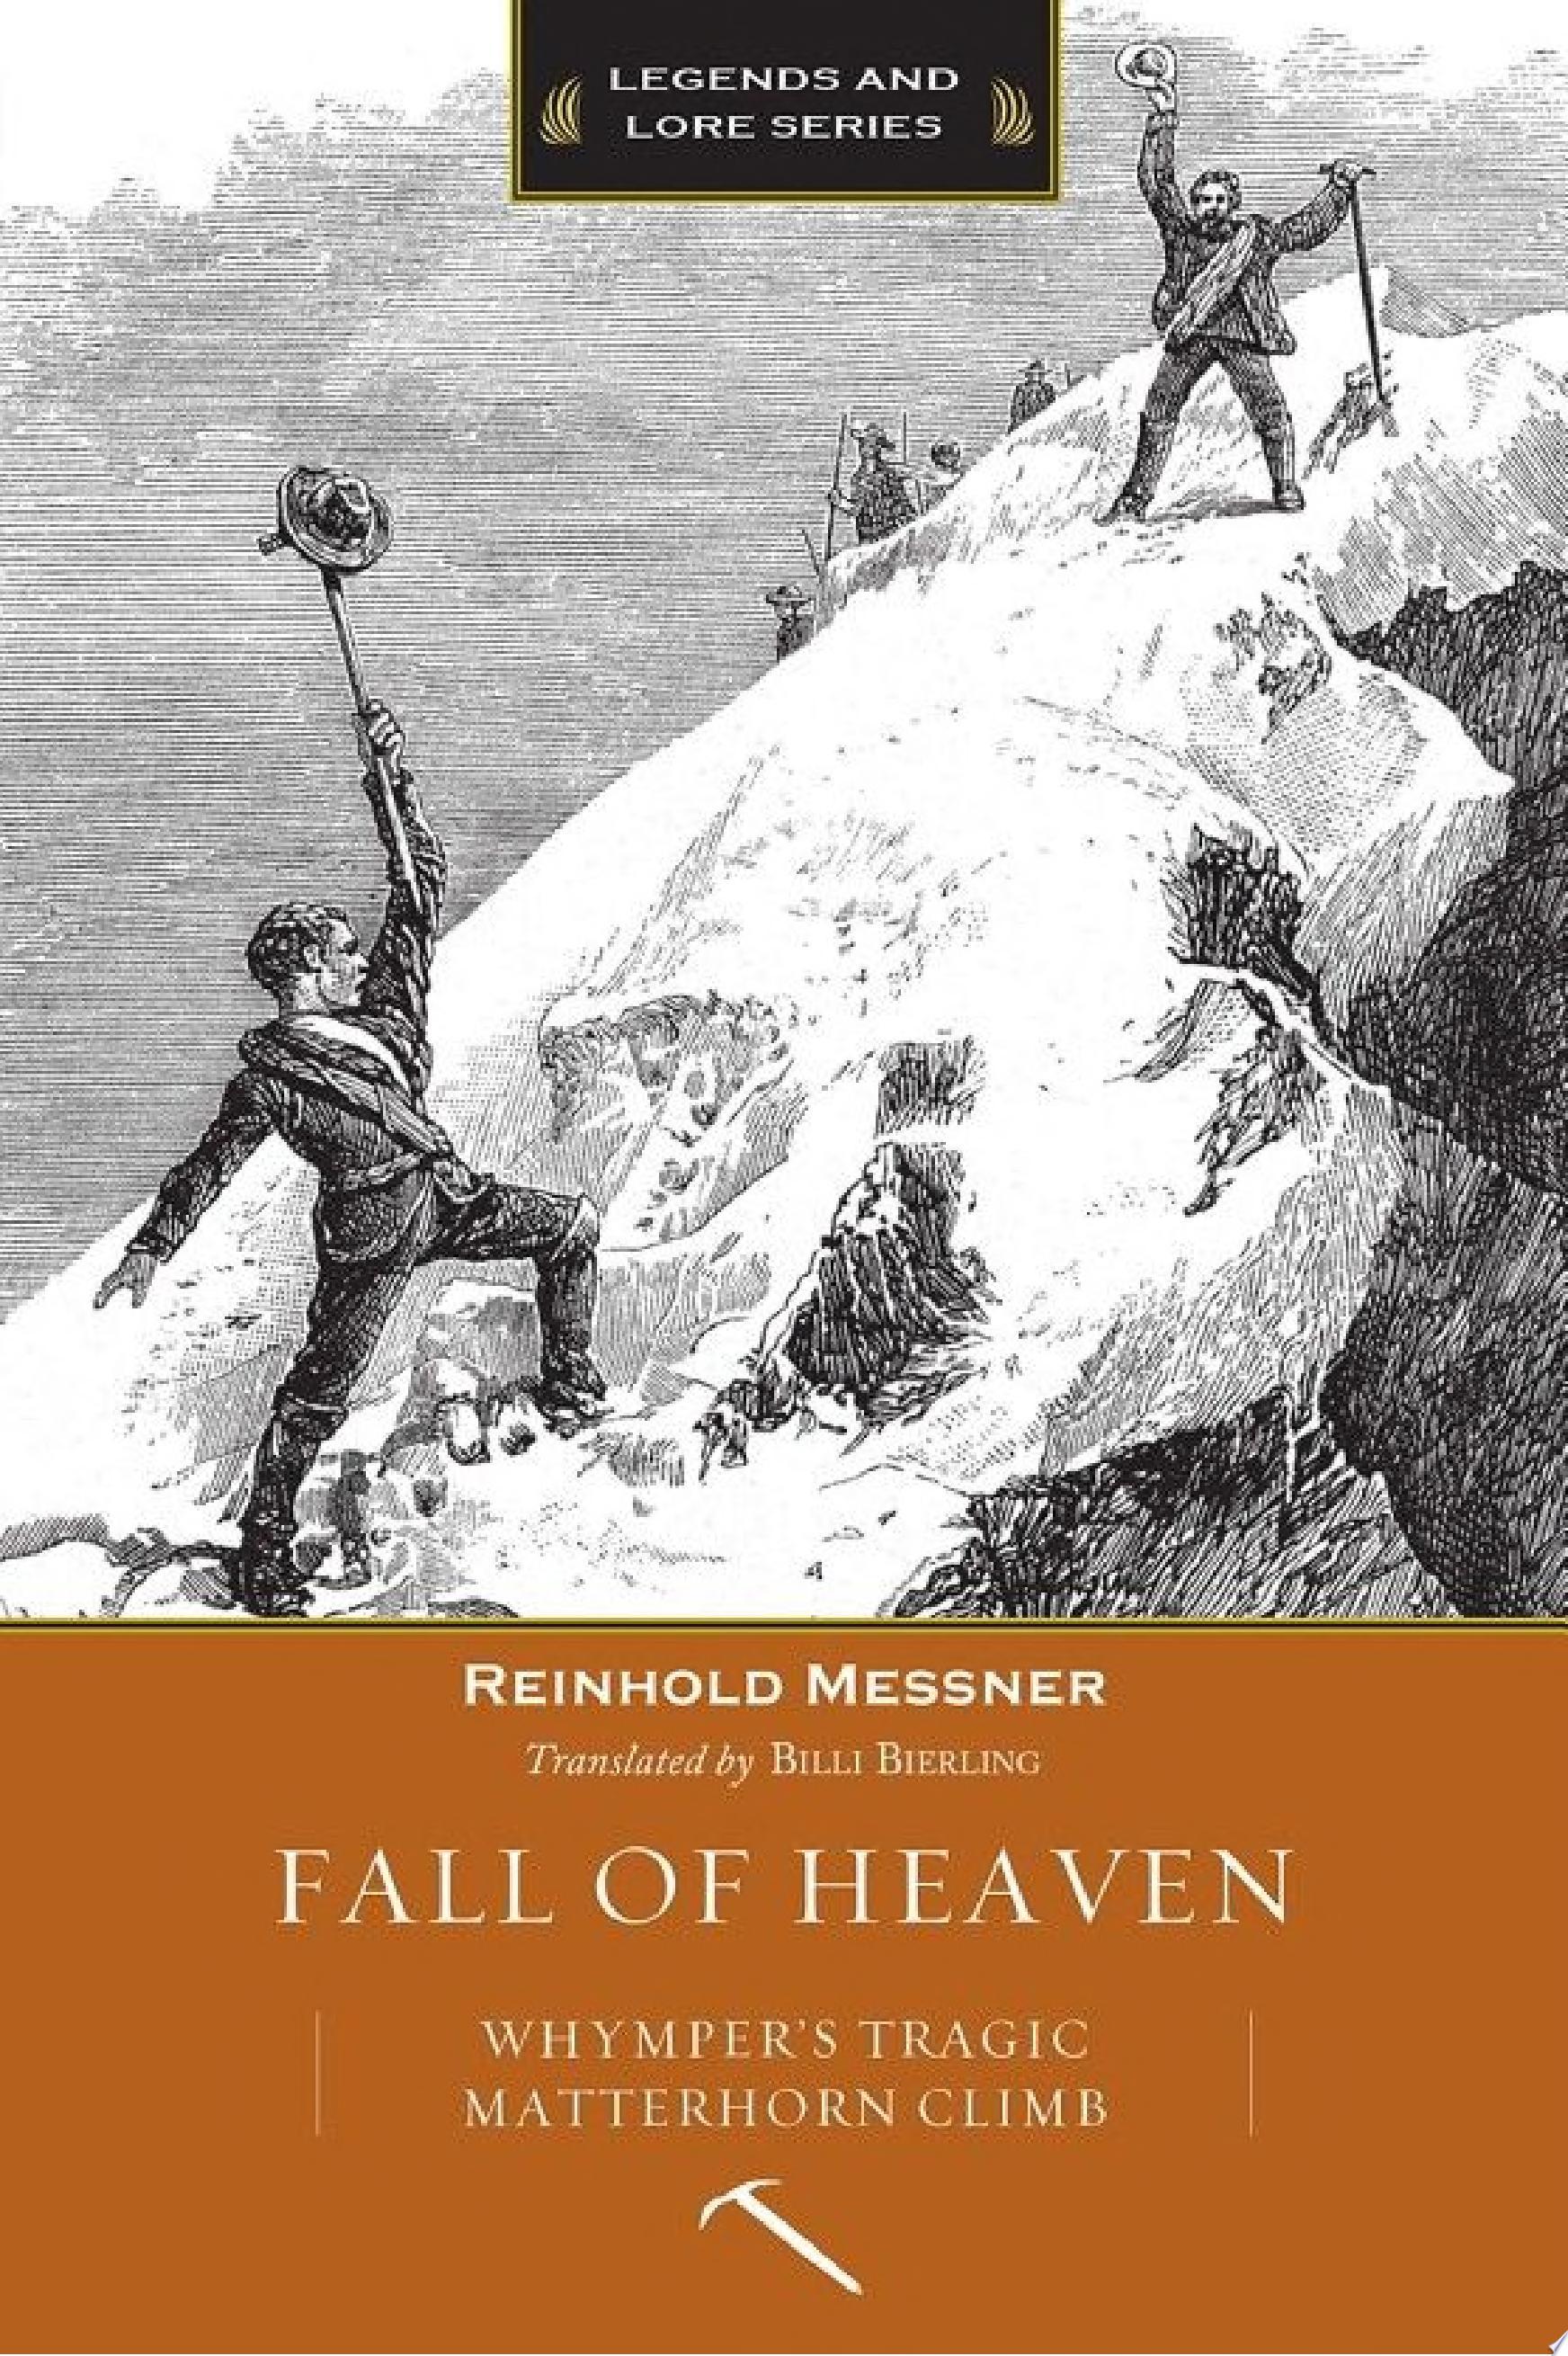 Fall of Heaven